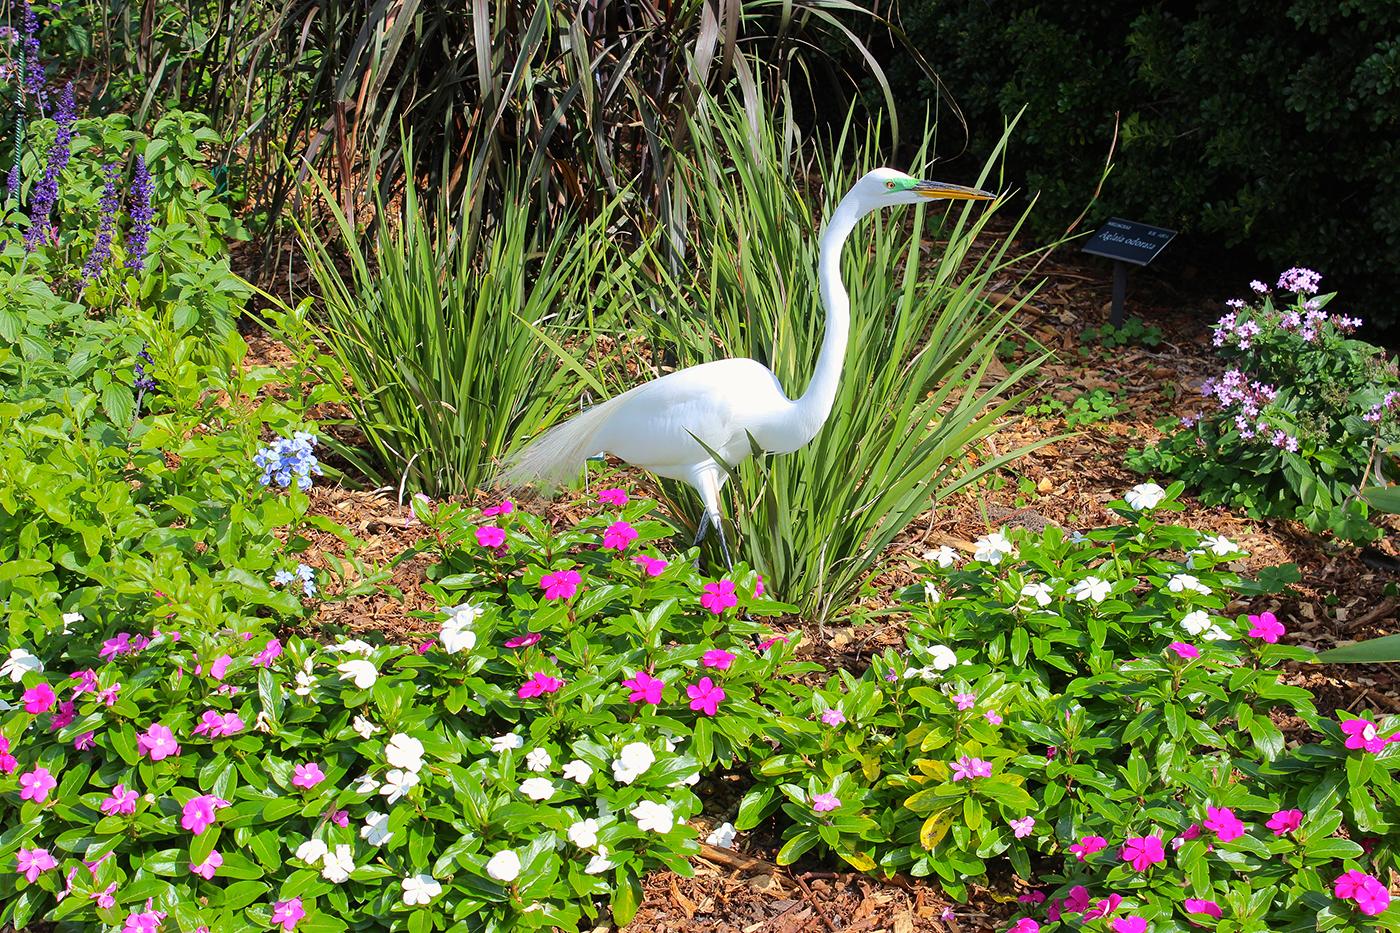 A Botanical Garden Blooms with Chagall Artes & contextos Selby6